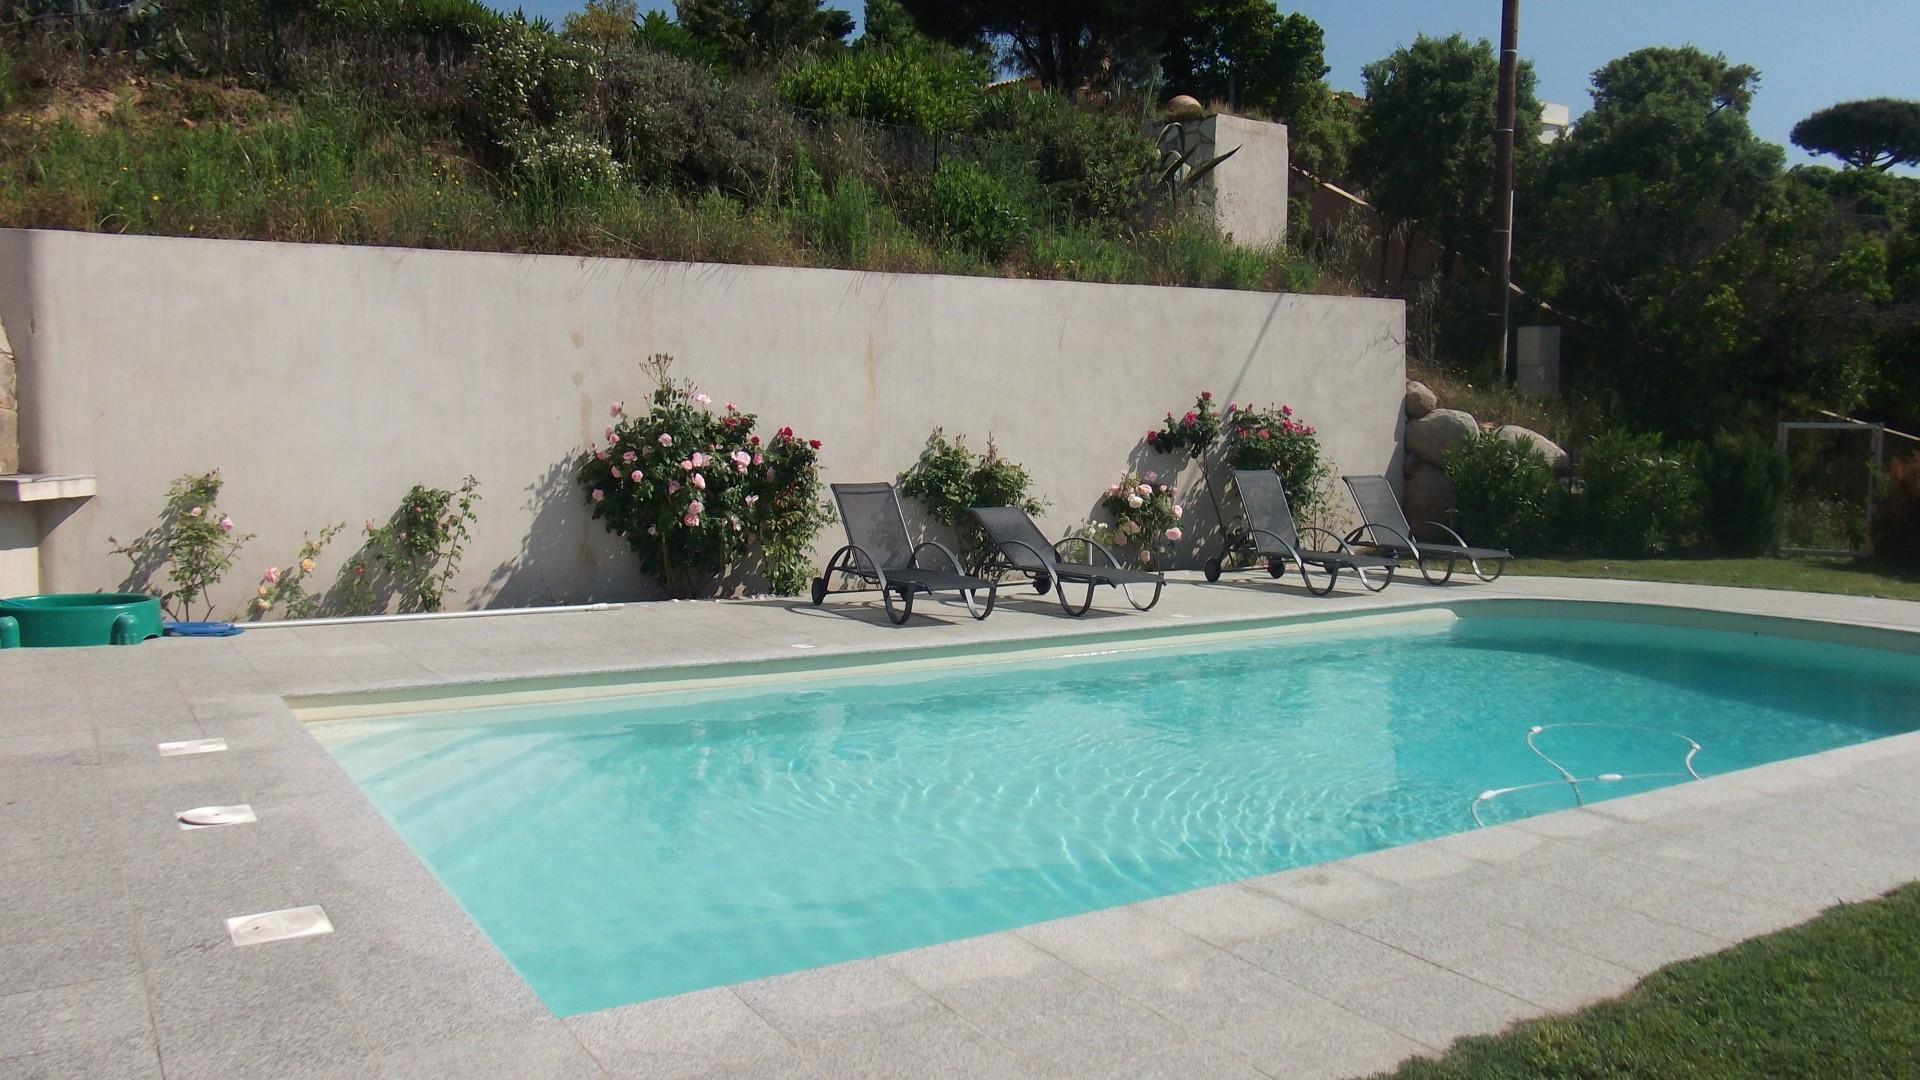 Korsika Ferienhaus mieten, Pool,